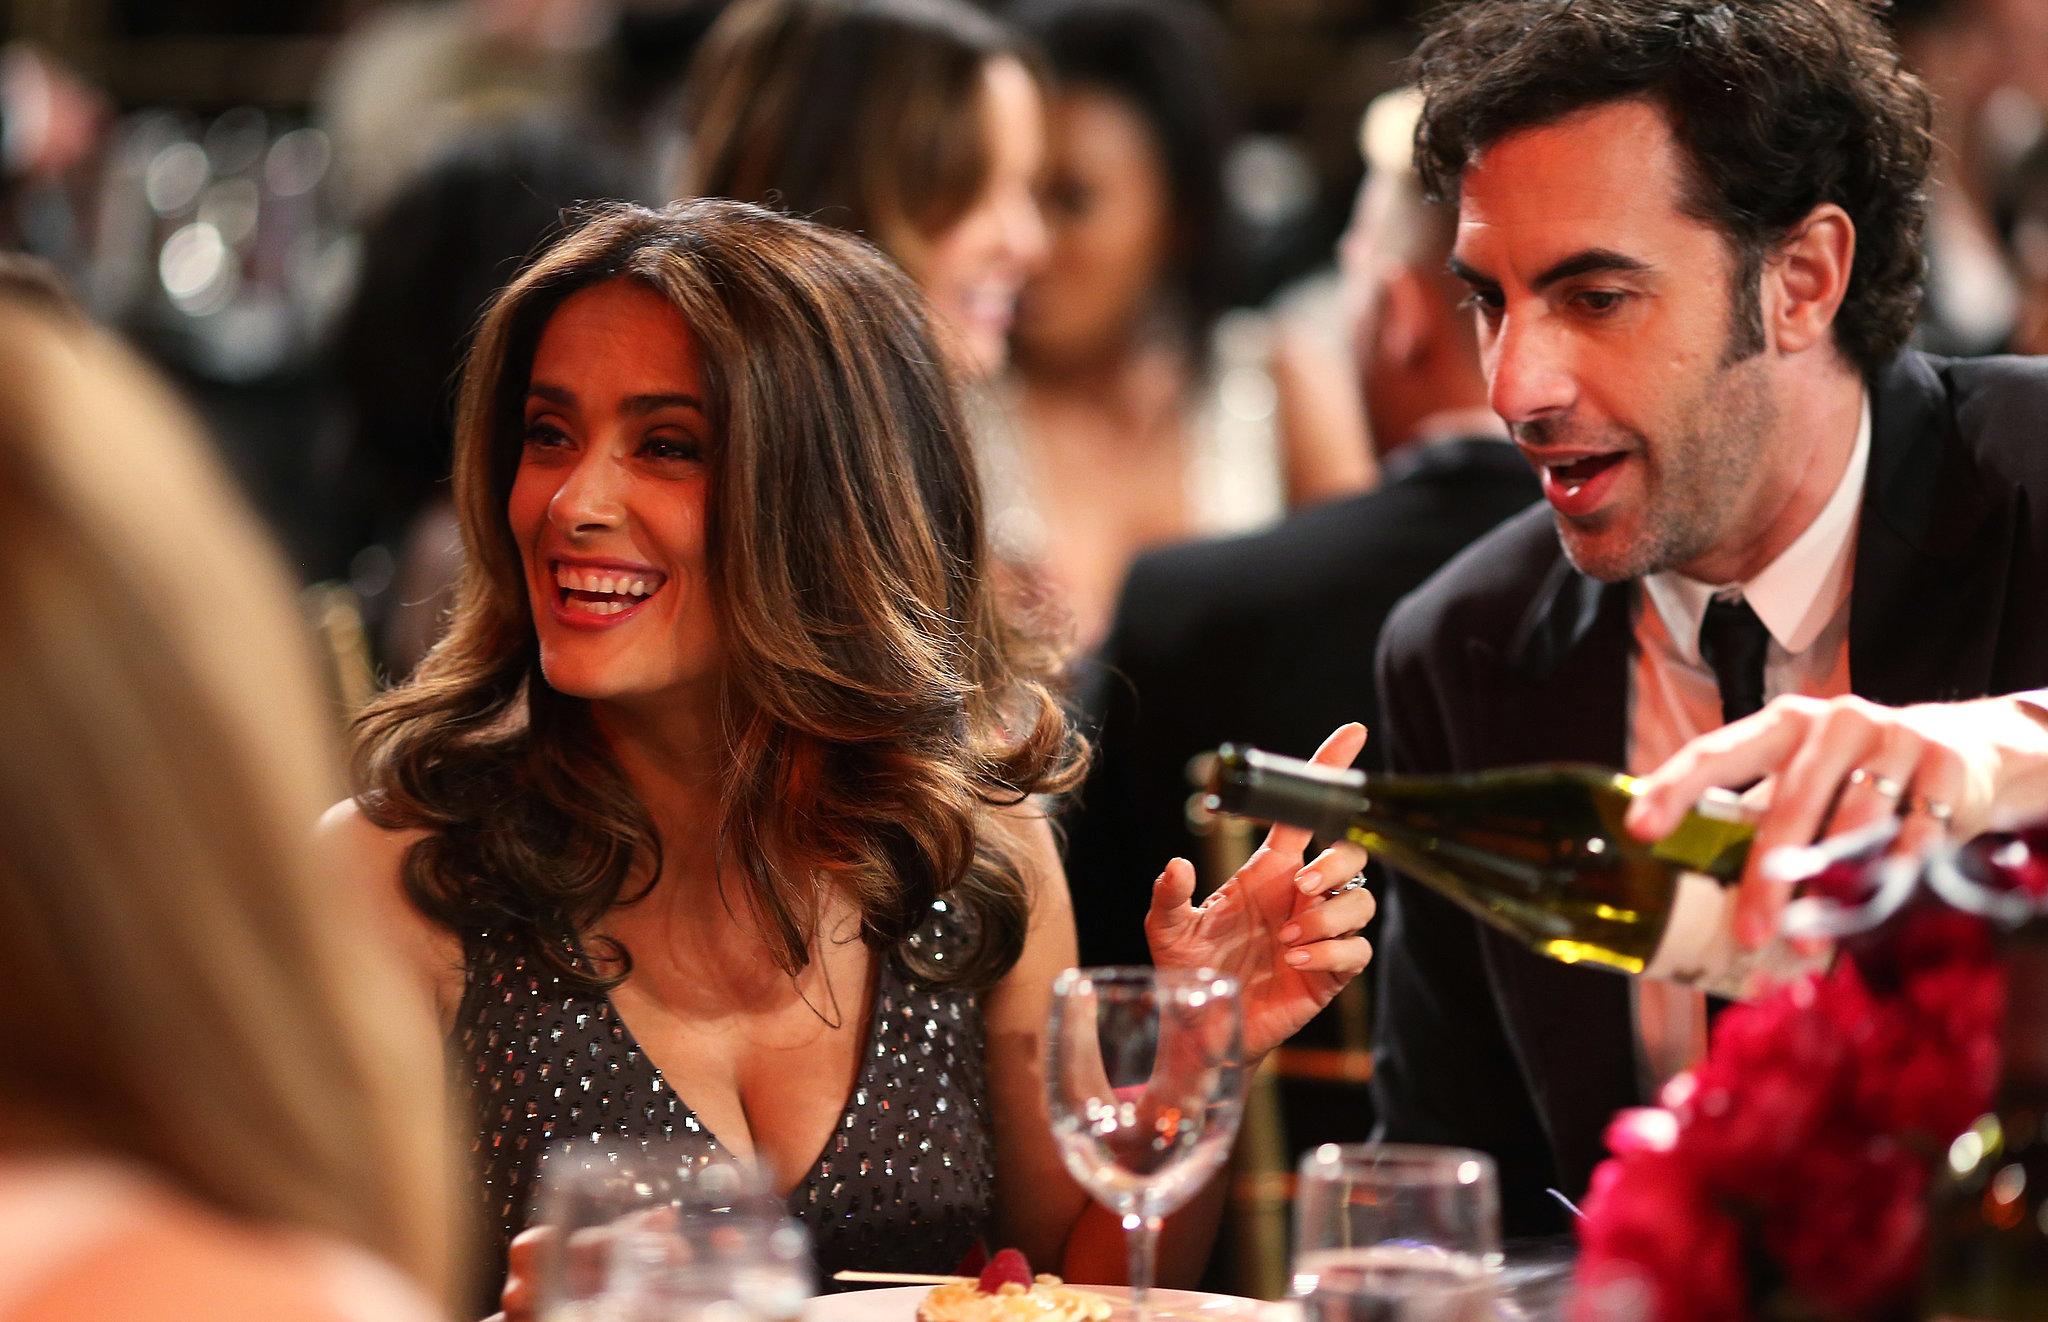 Sacha Baron Cohen poured Salma Hayek a glass of wine.